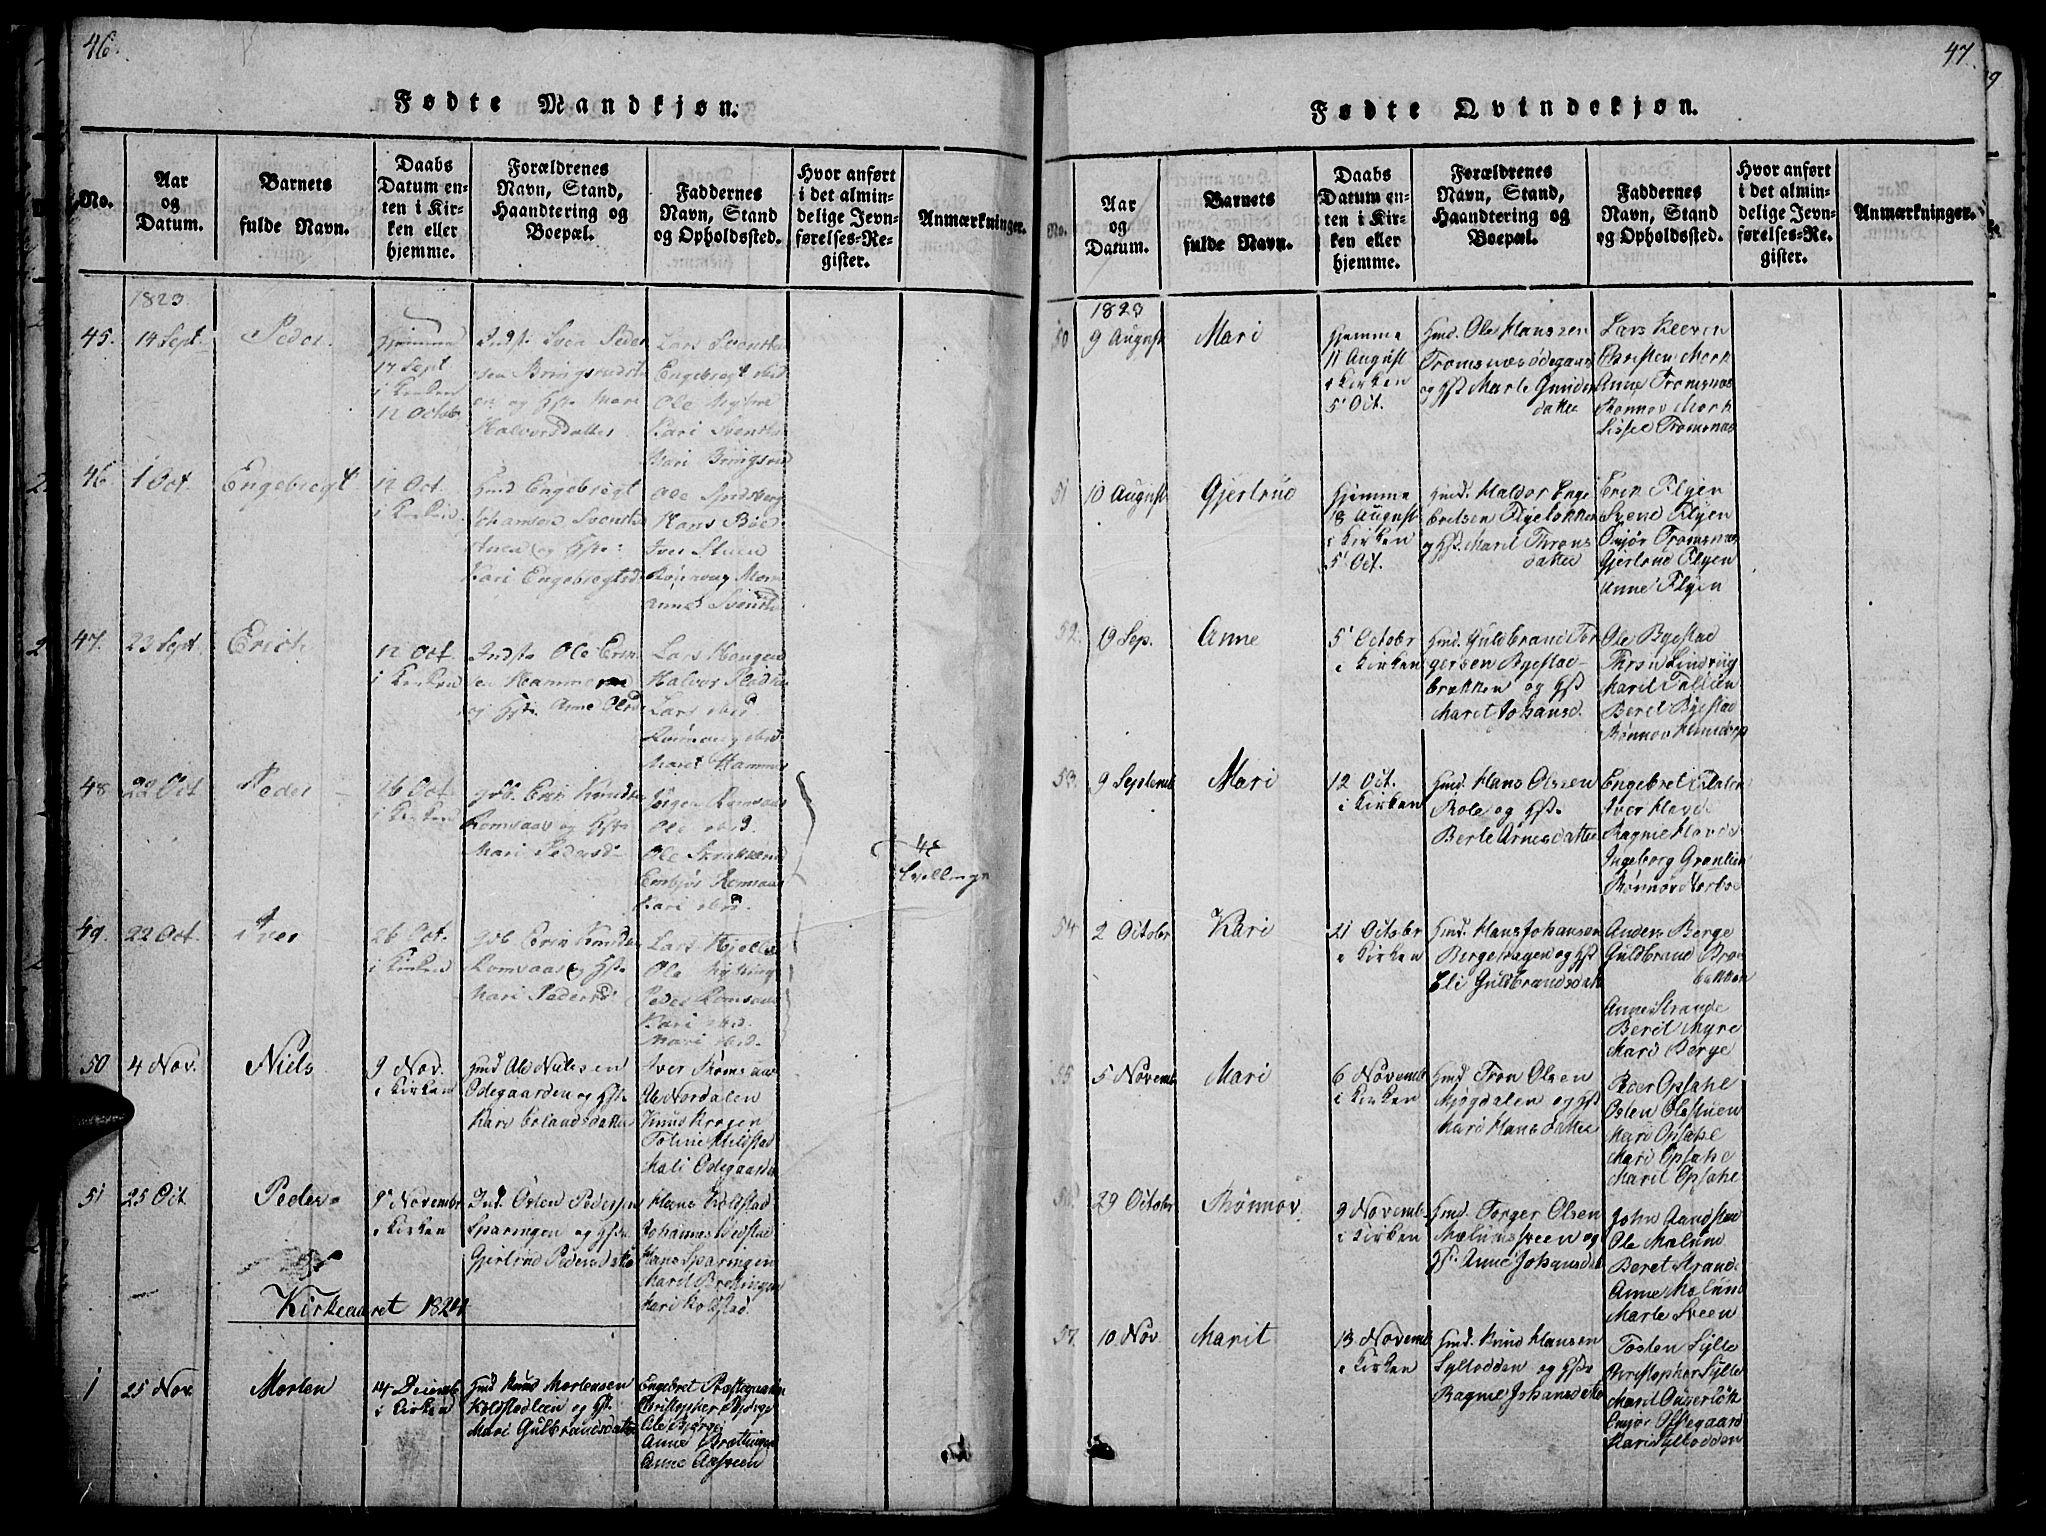 SAH, Ringebu prestekontor, Ministerialbok nr. 4, 1821-1839, s. 46-47